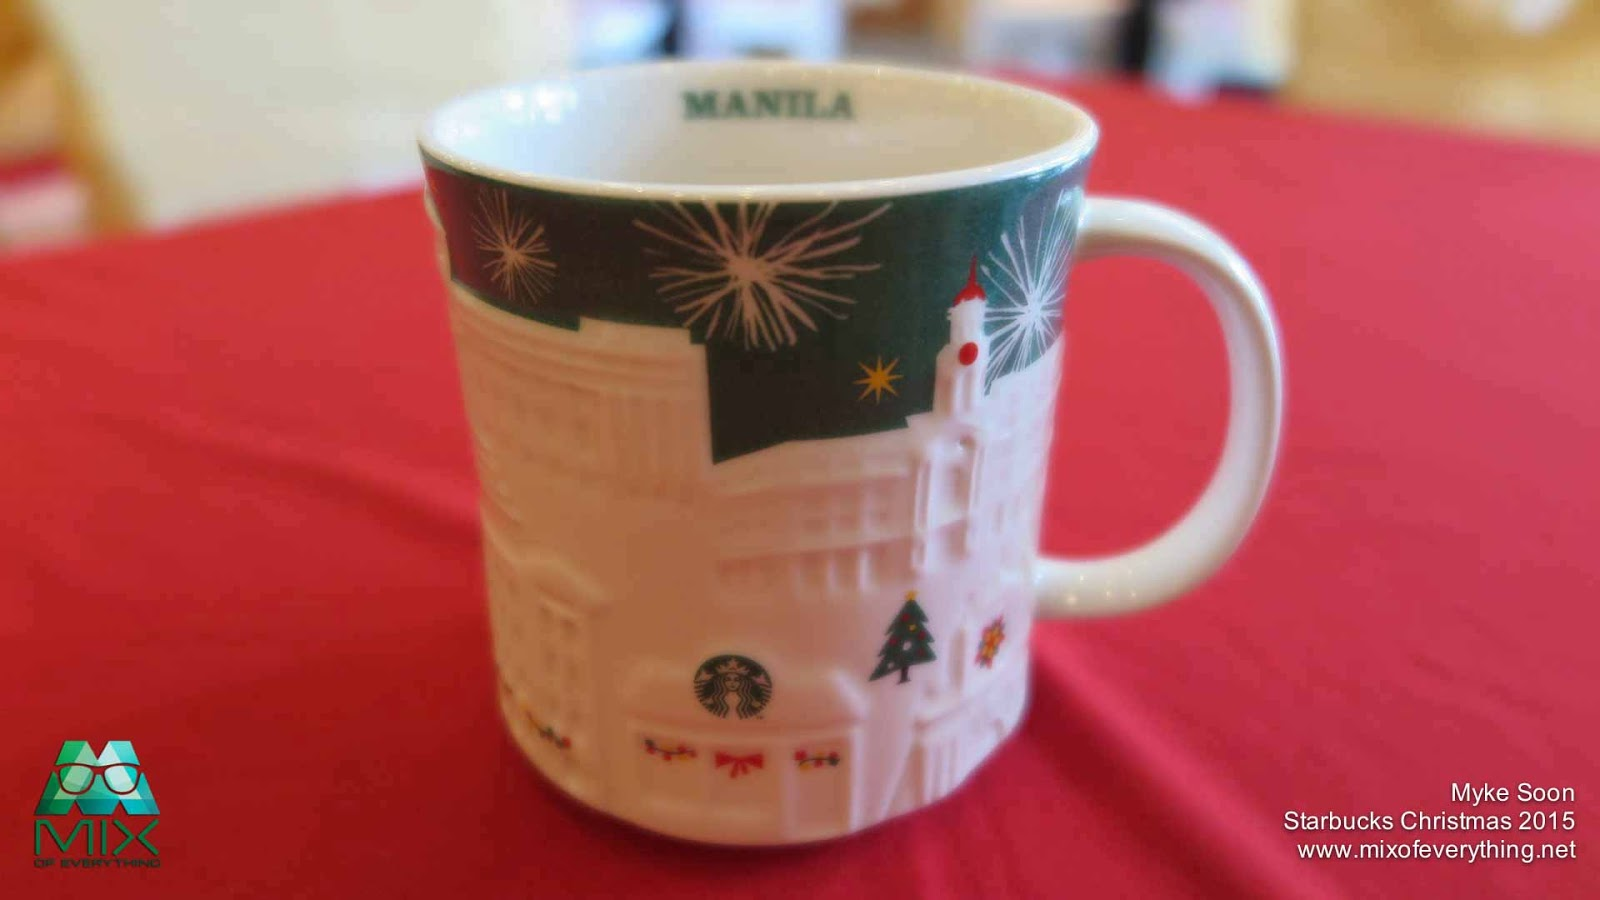 Starbucks Christmas 2015 Holiday Merchandise! Hello